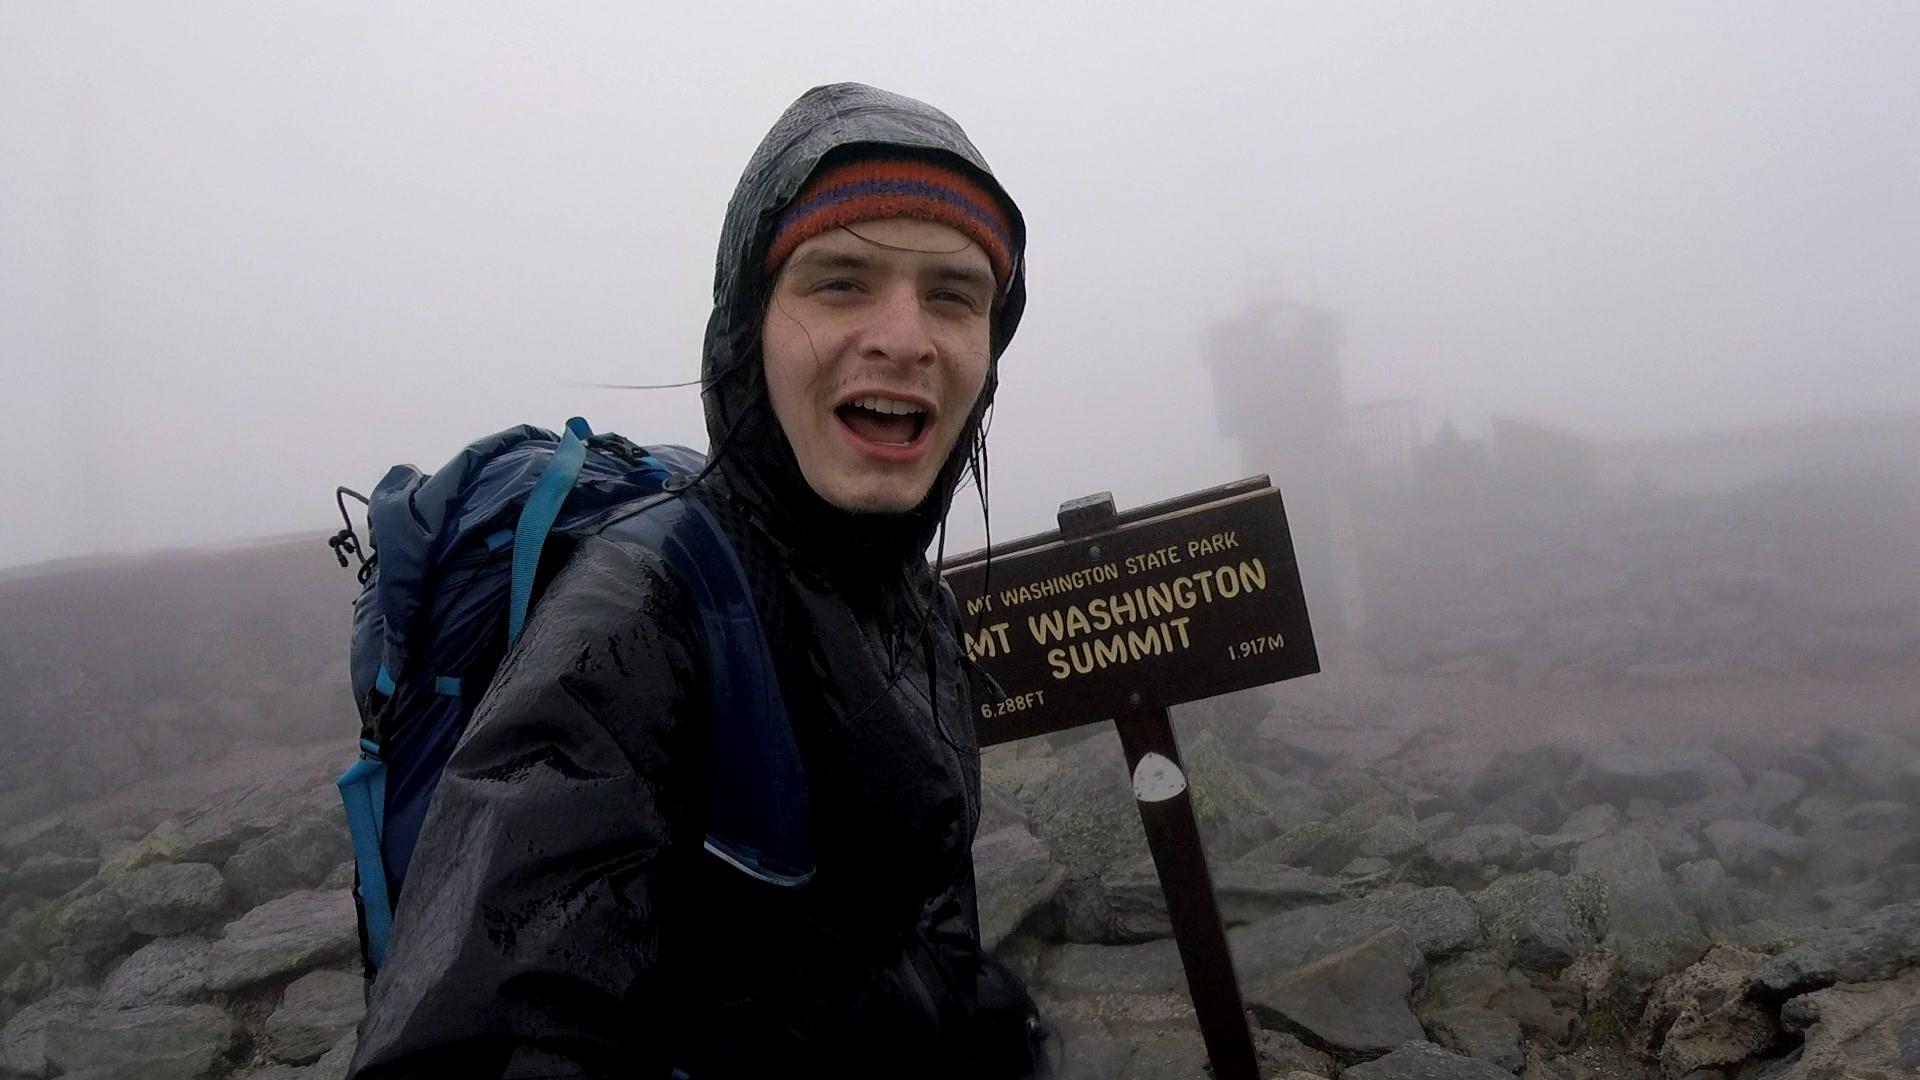 Standing atop summit of Agiocochook, AKA Mt. Washington, in the rain